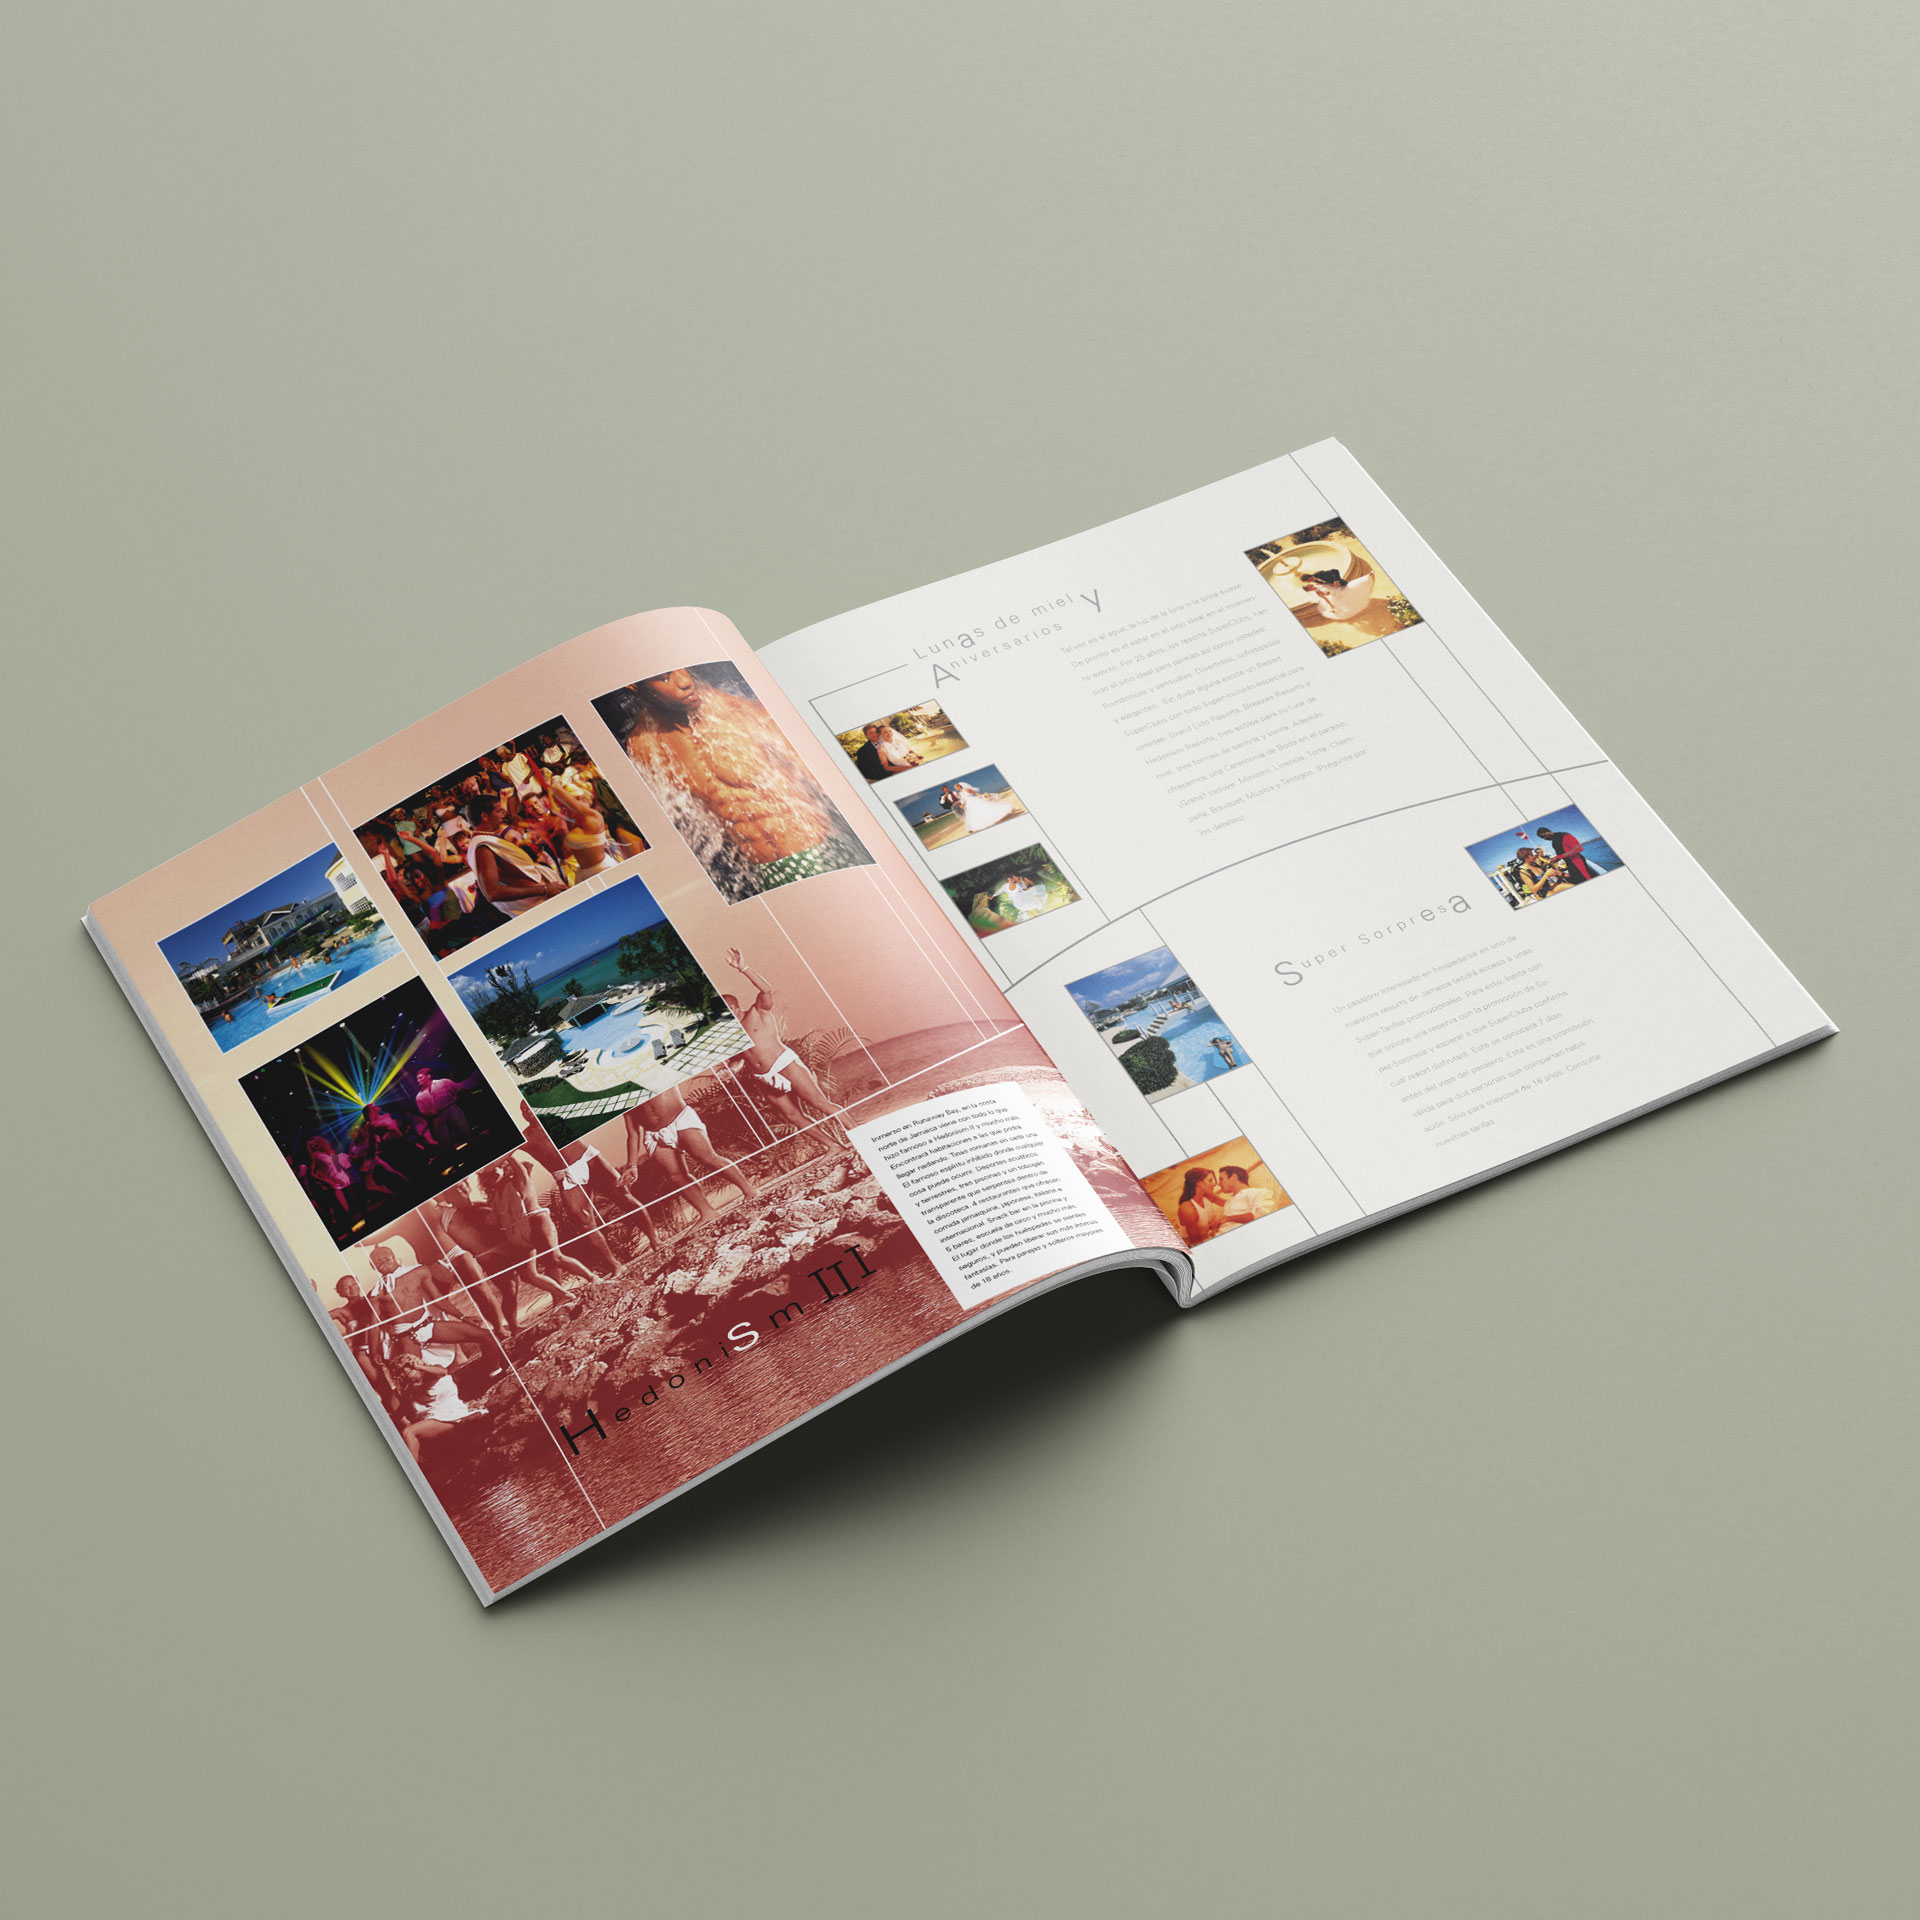 Portafolio Hoteles y Resorts SuperClubs